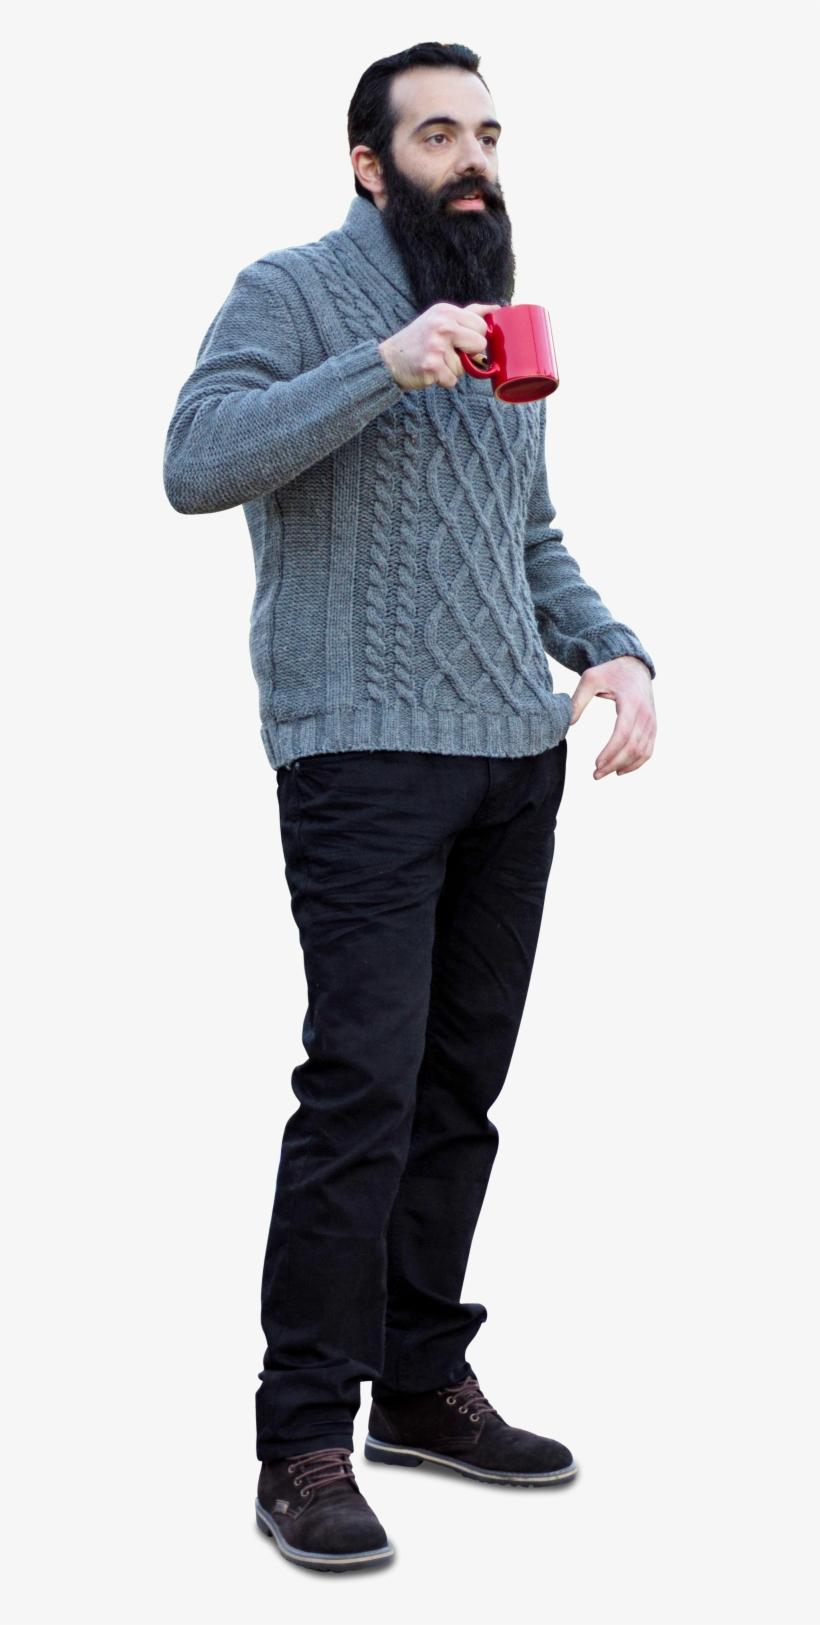 Bearded Man In Sweater Drinking Cofee.